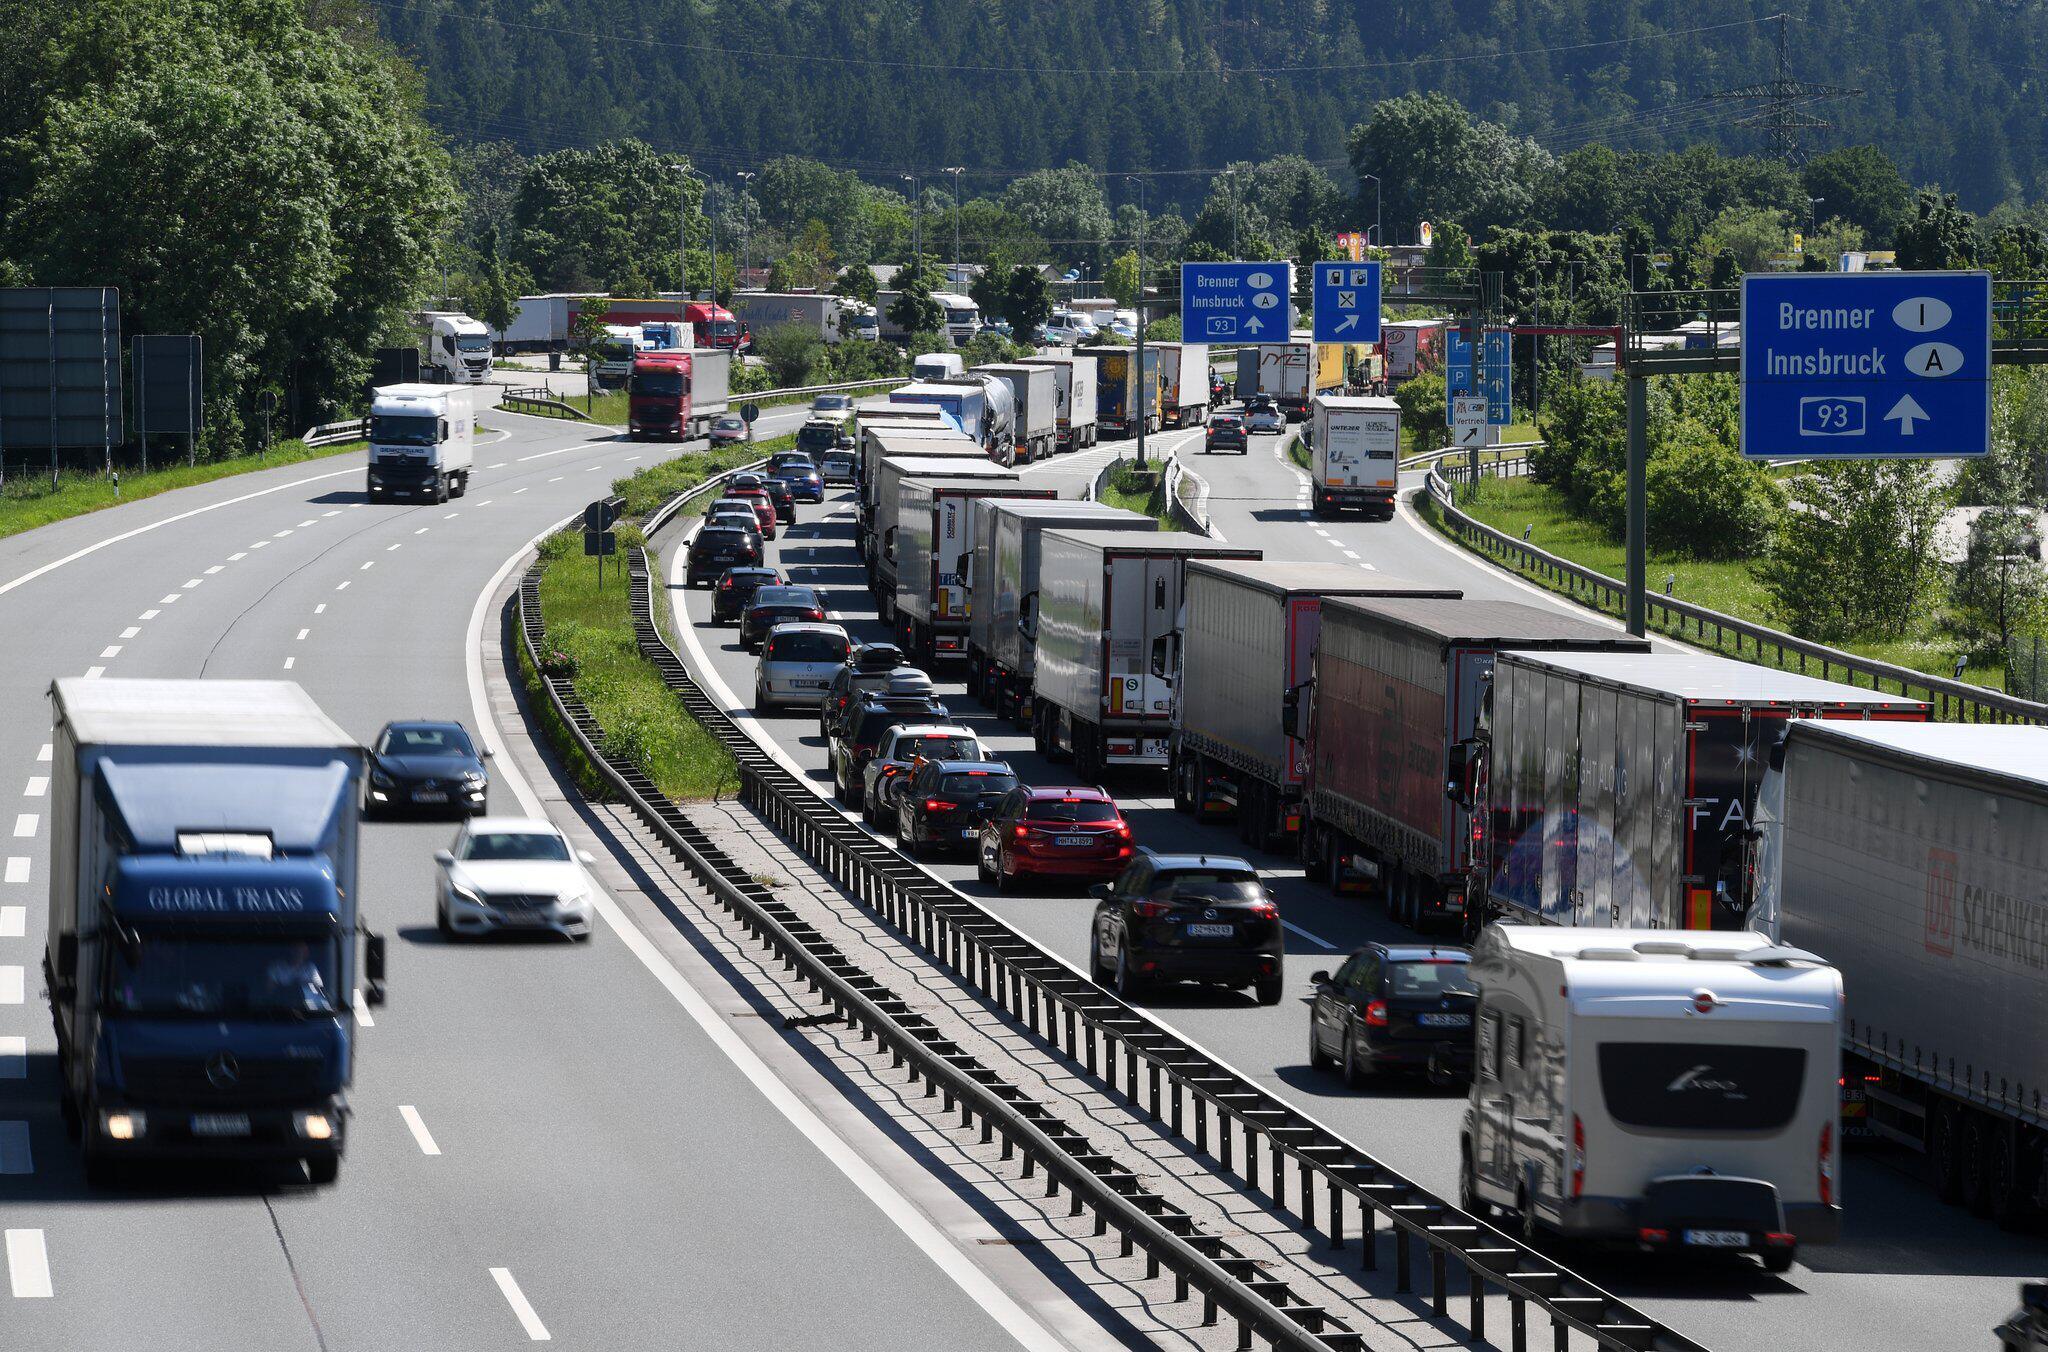 Bild zu EU missbilligt Tiroler Blockabfertigung als «unverhältnismäßig»